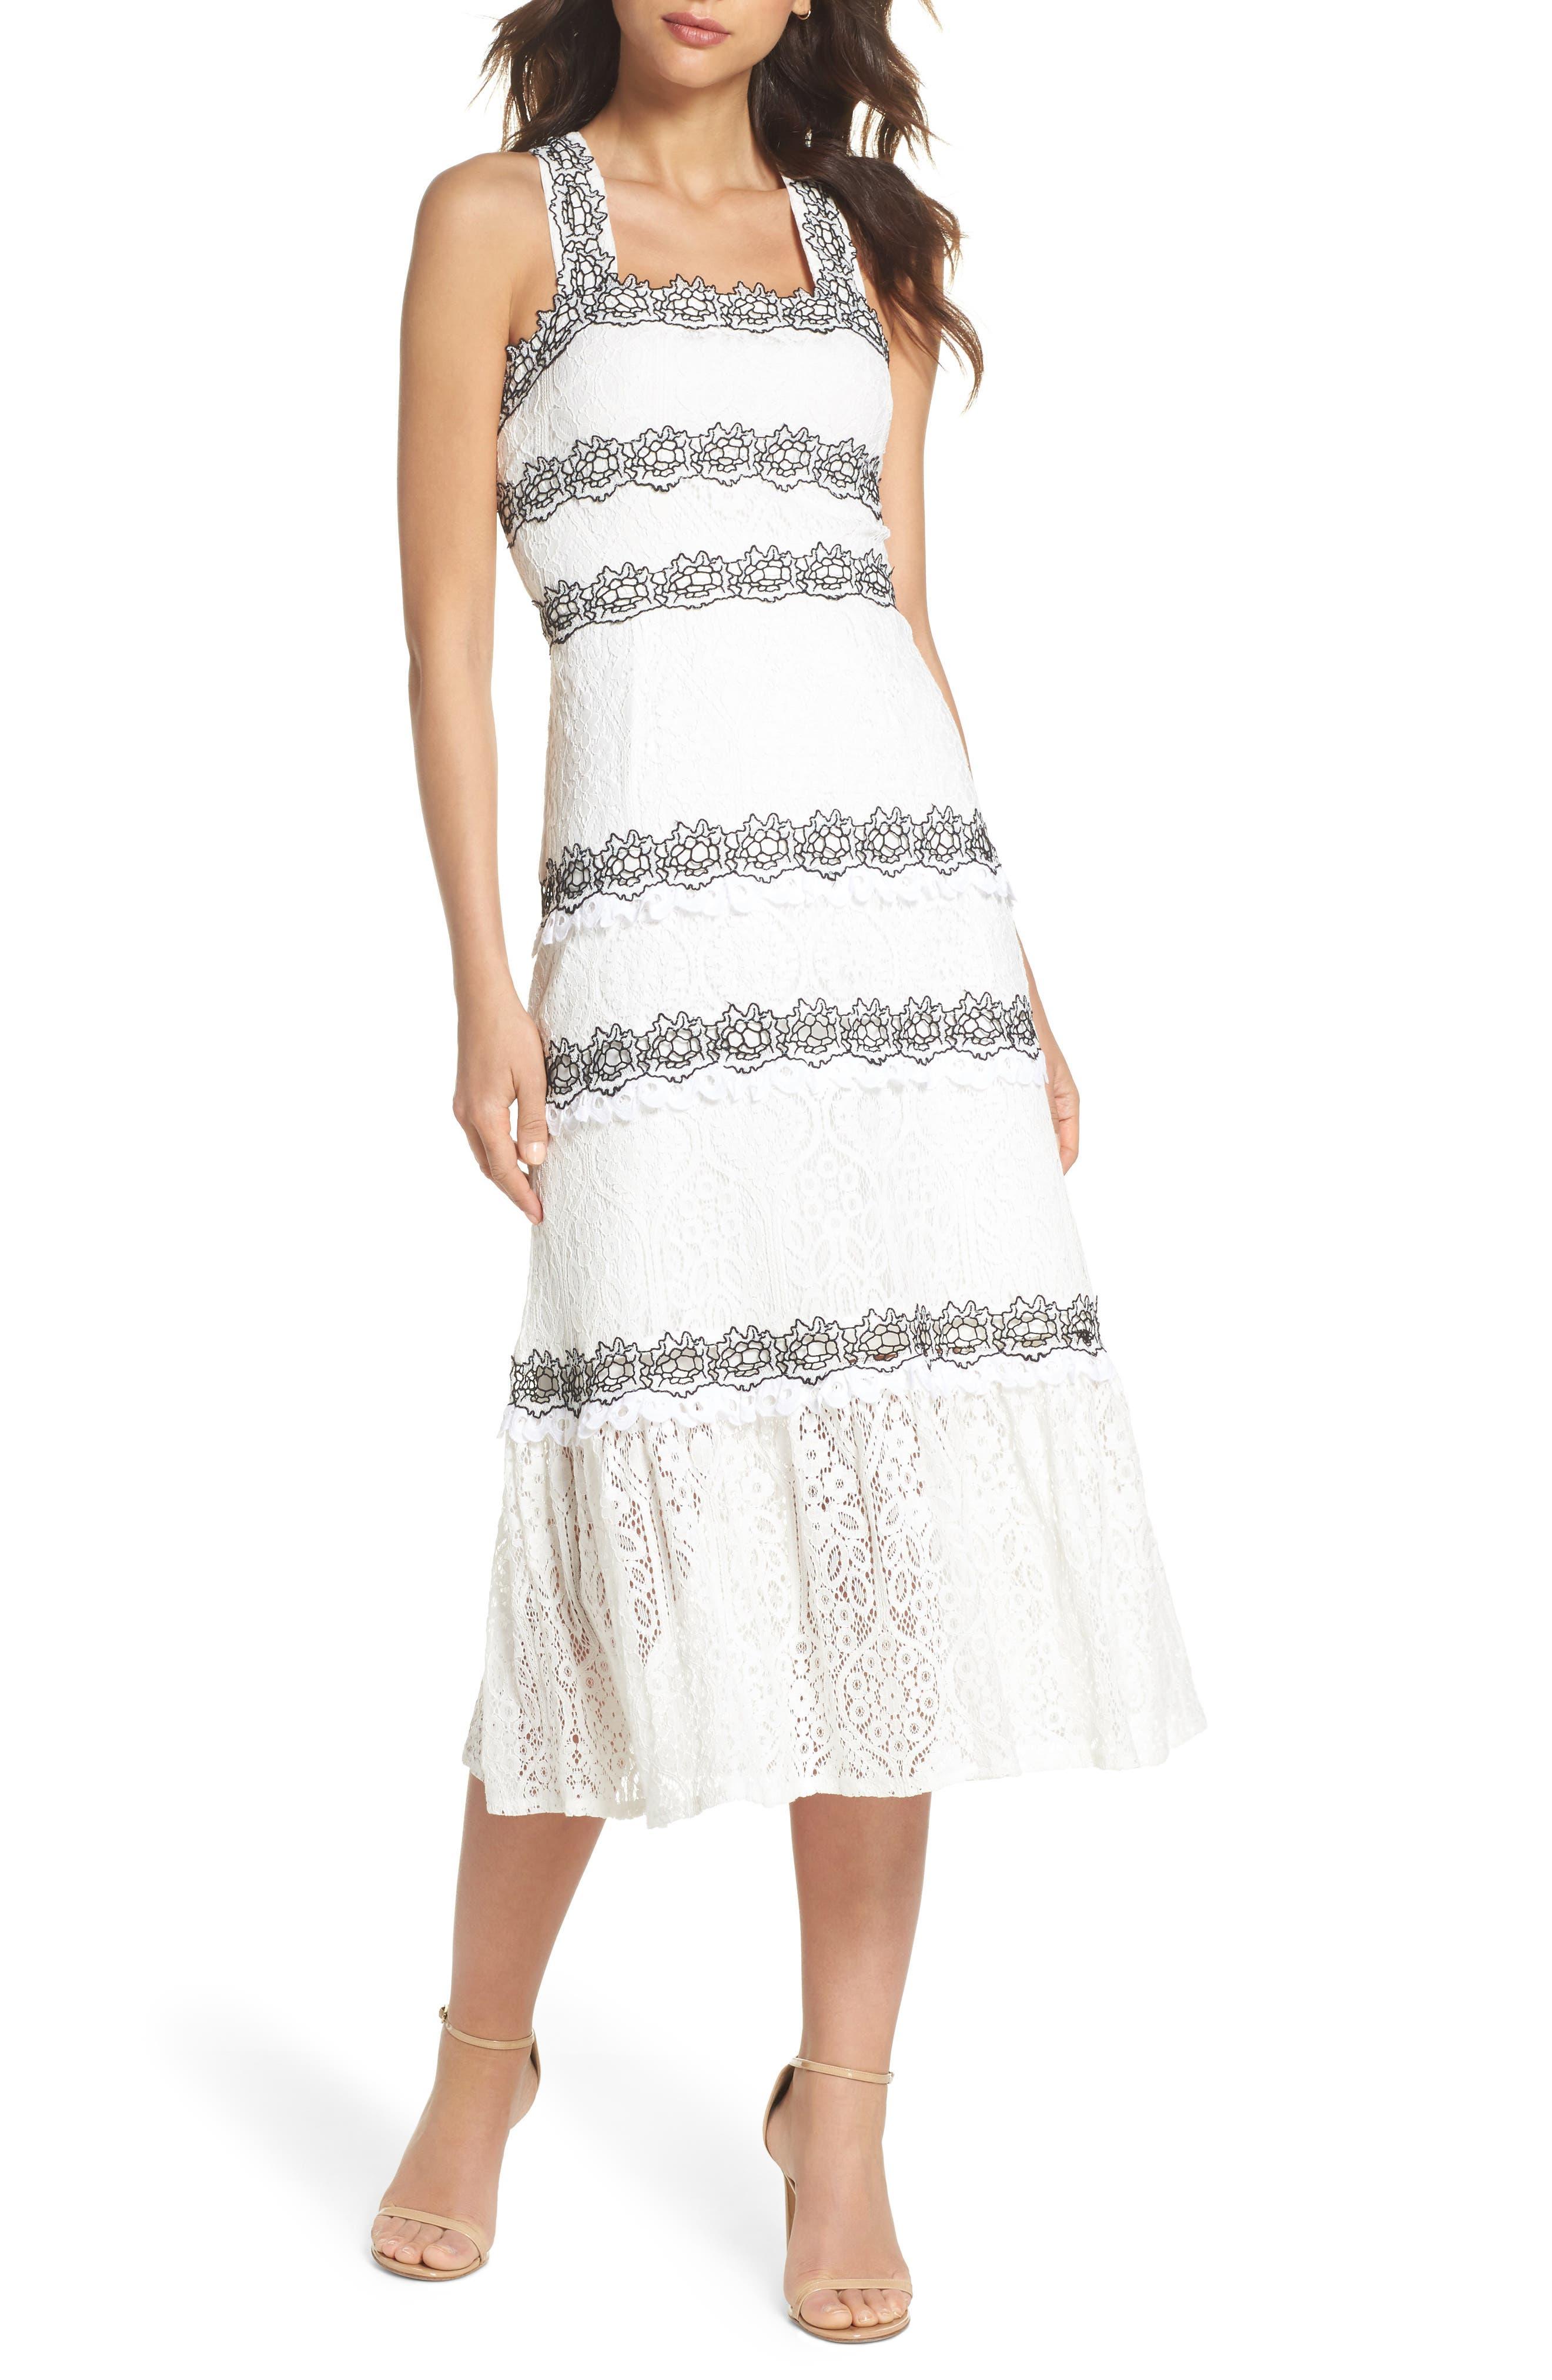 Frances Embroidered Lace Midi Dress,                             Main thumbnail 1, color,                             102